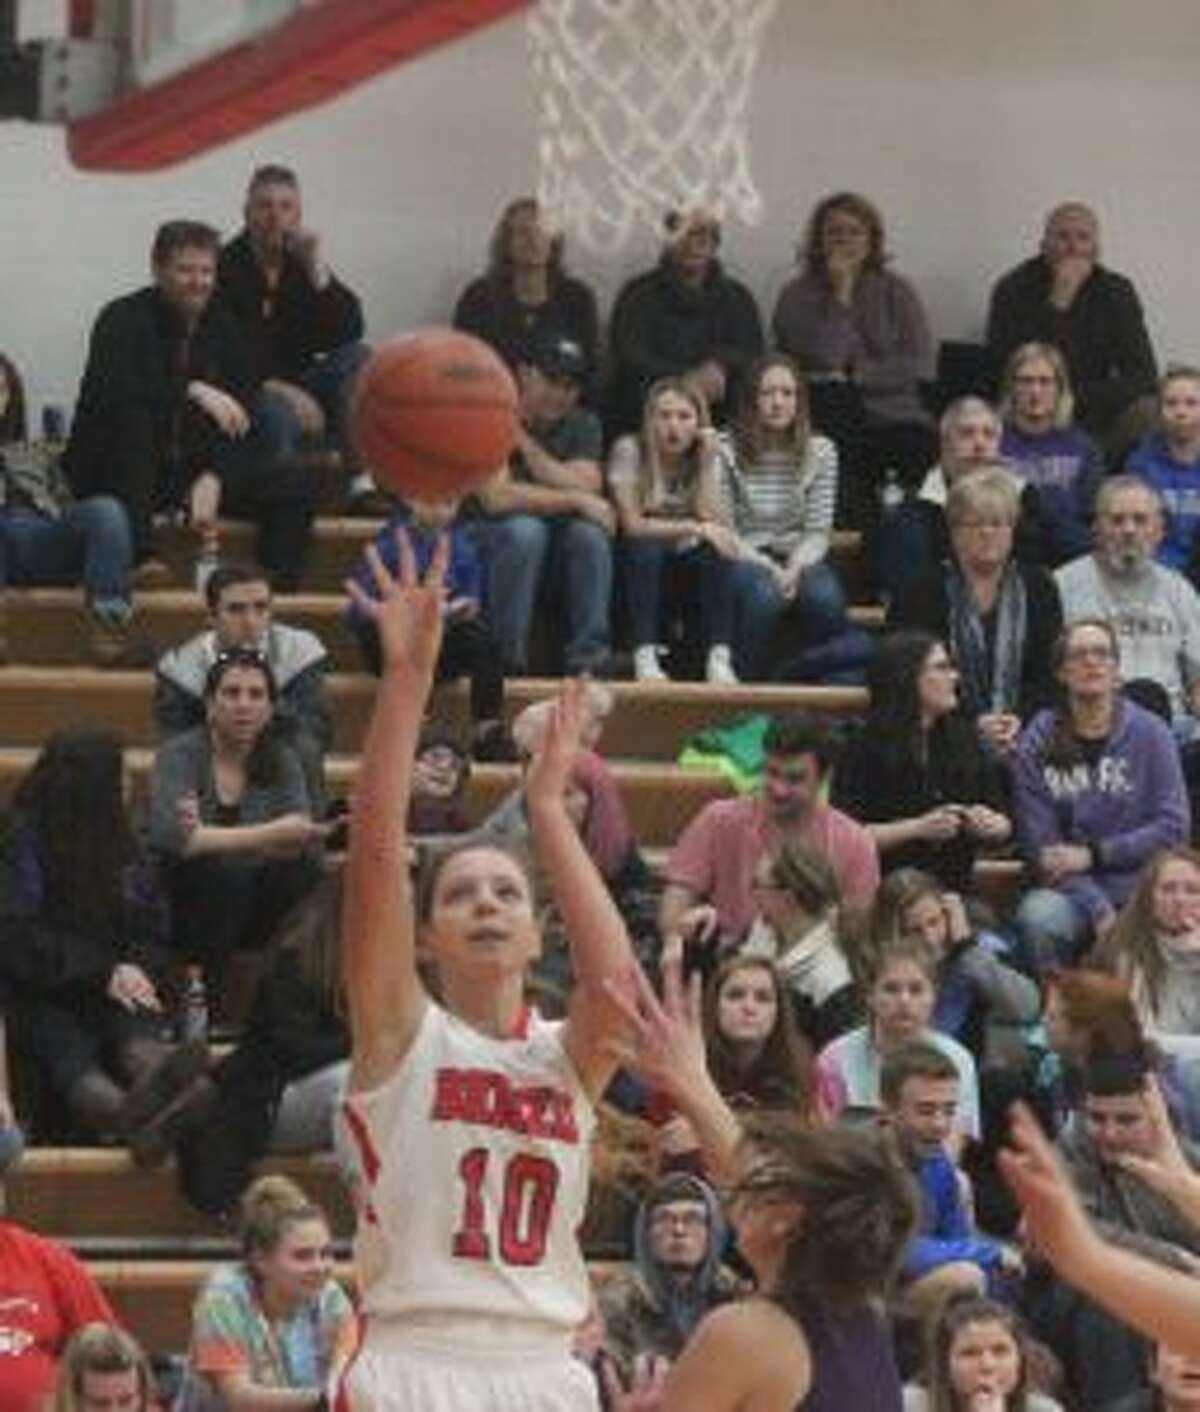 Bella Huddleston fires a short jump from the block. (Photo/Robert Myers)